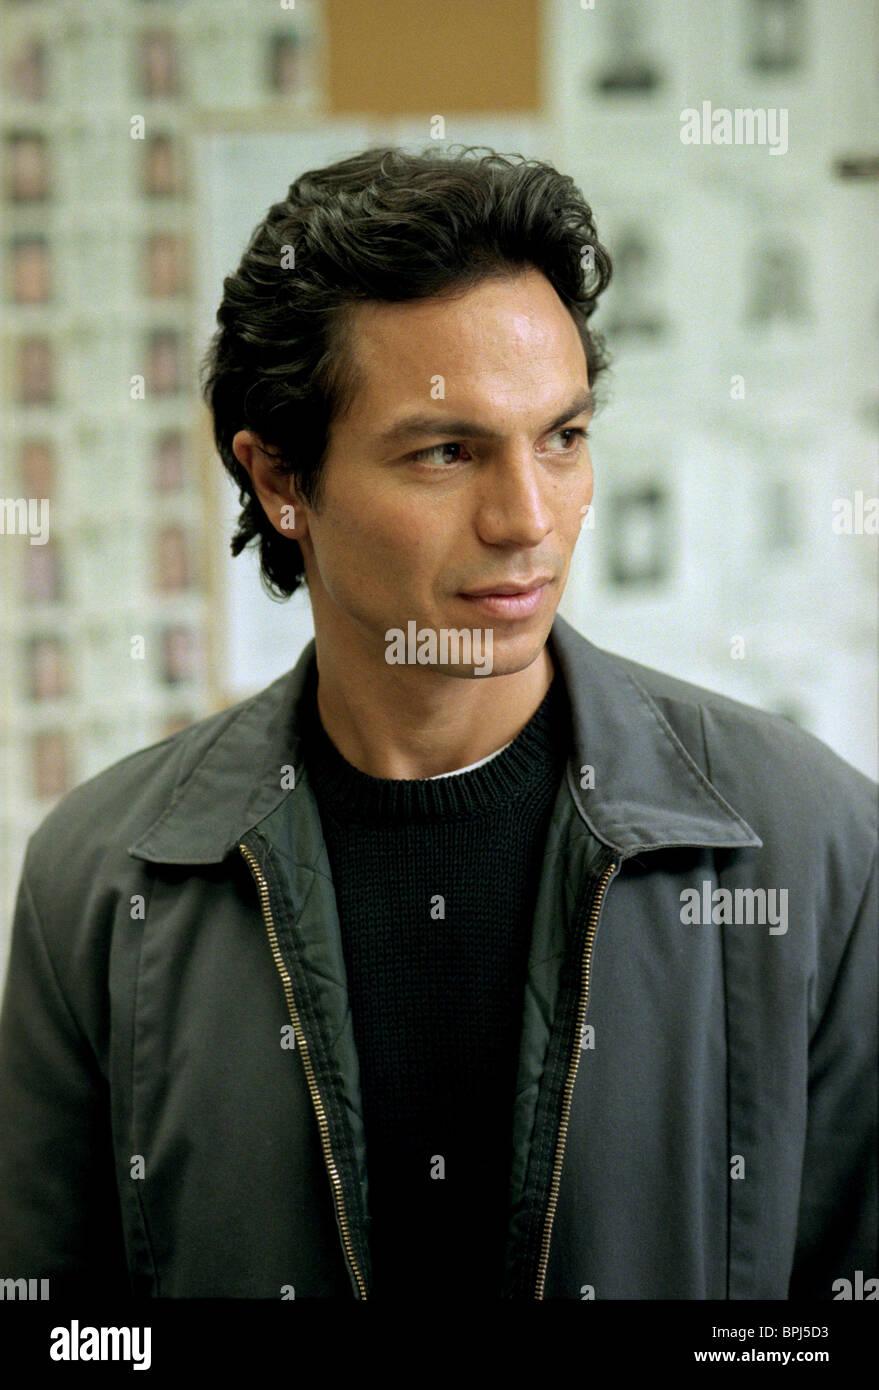 BENJAMIN BRATT ABANDONNER (2002) Photo Stock